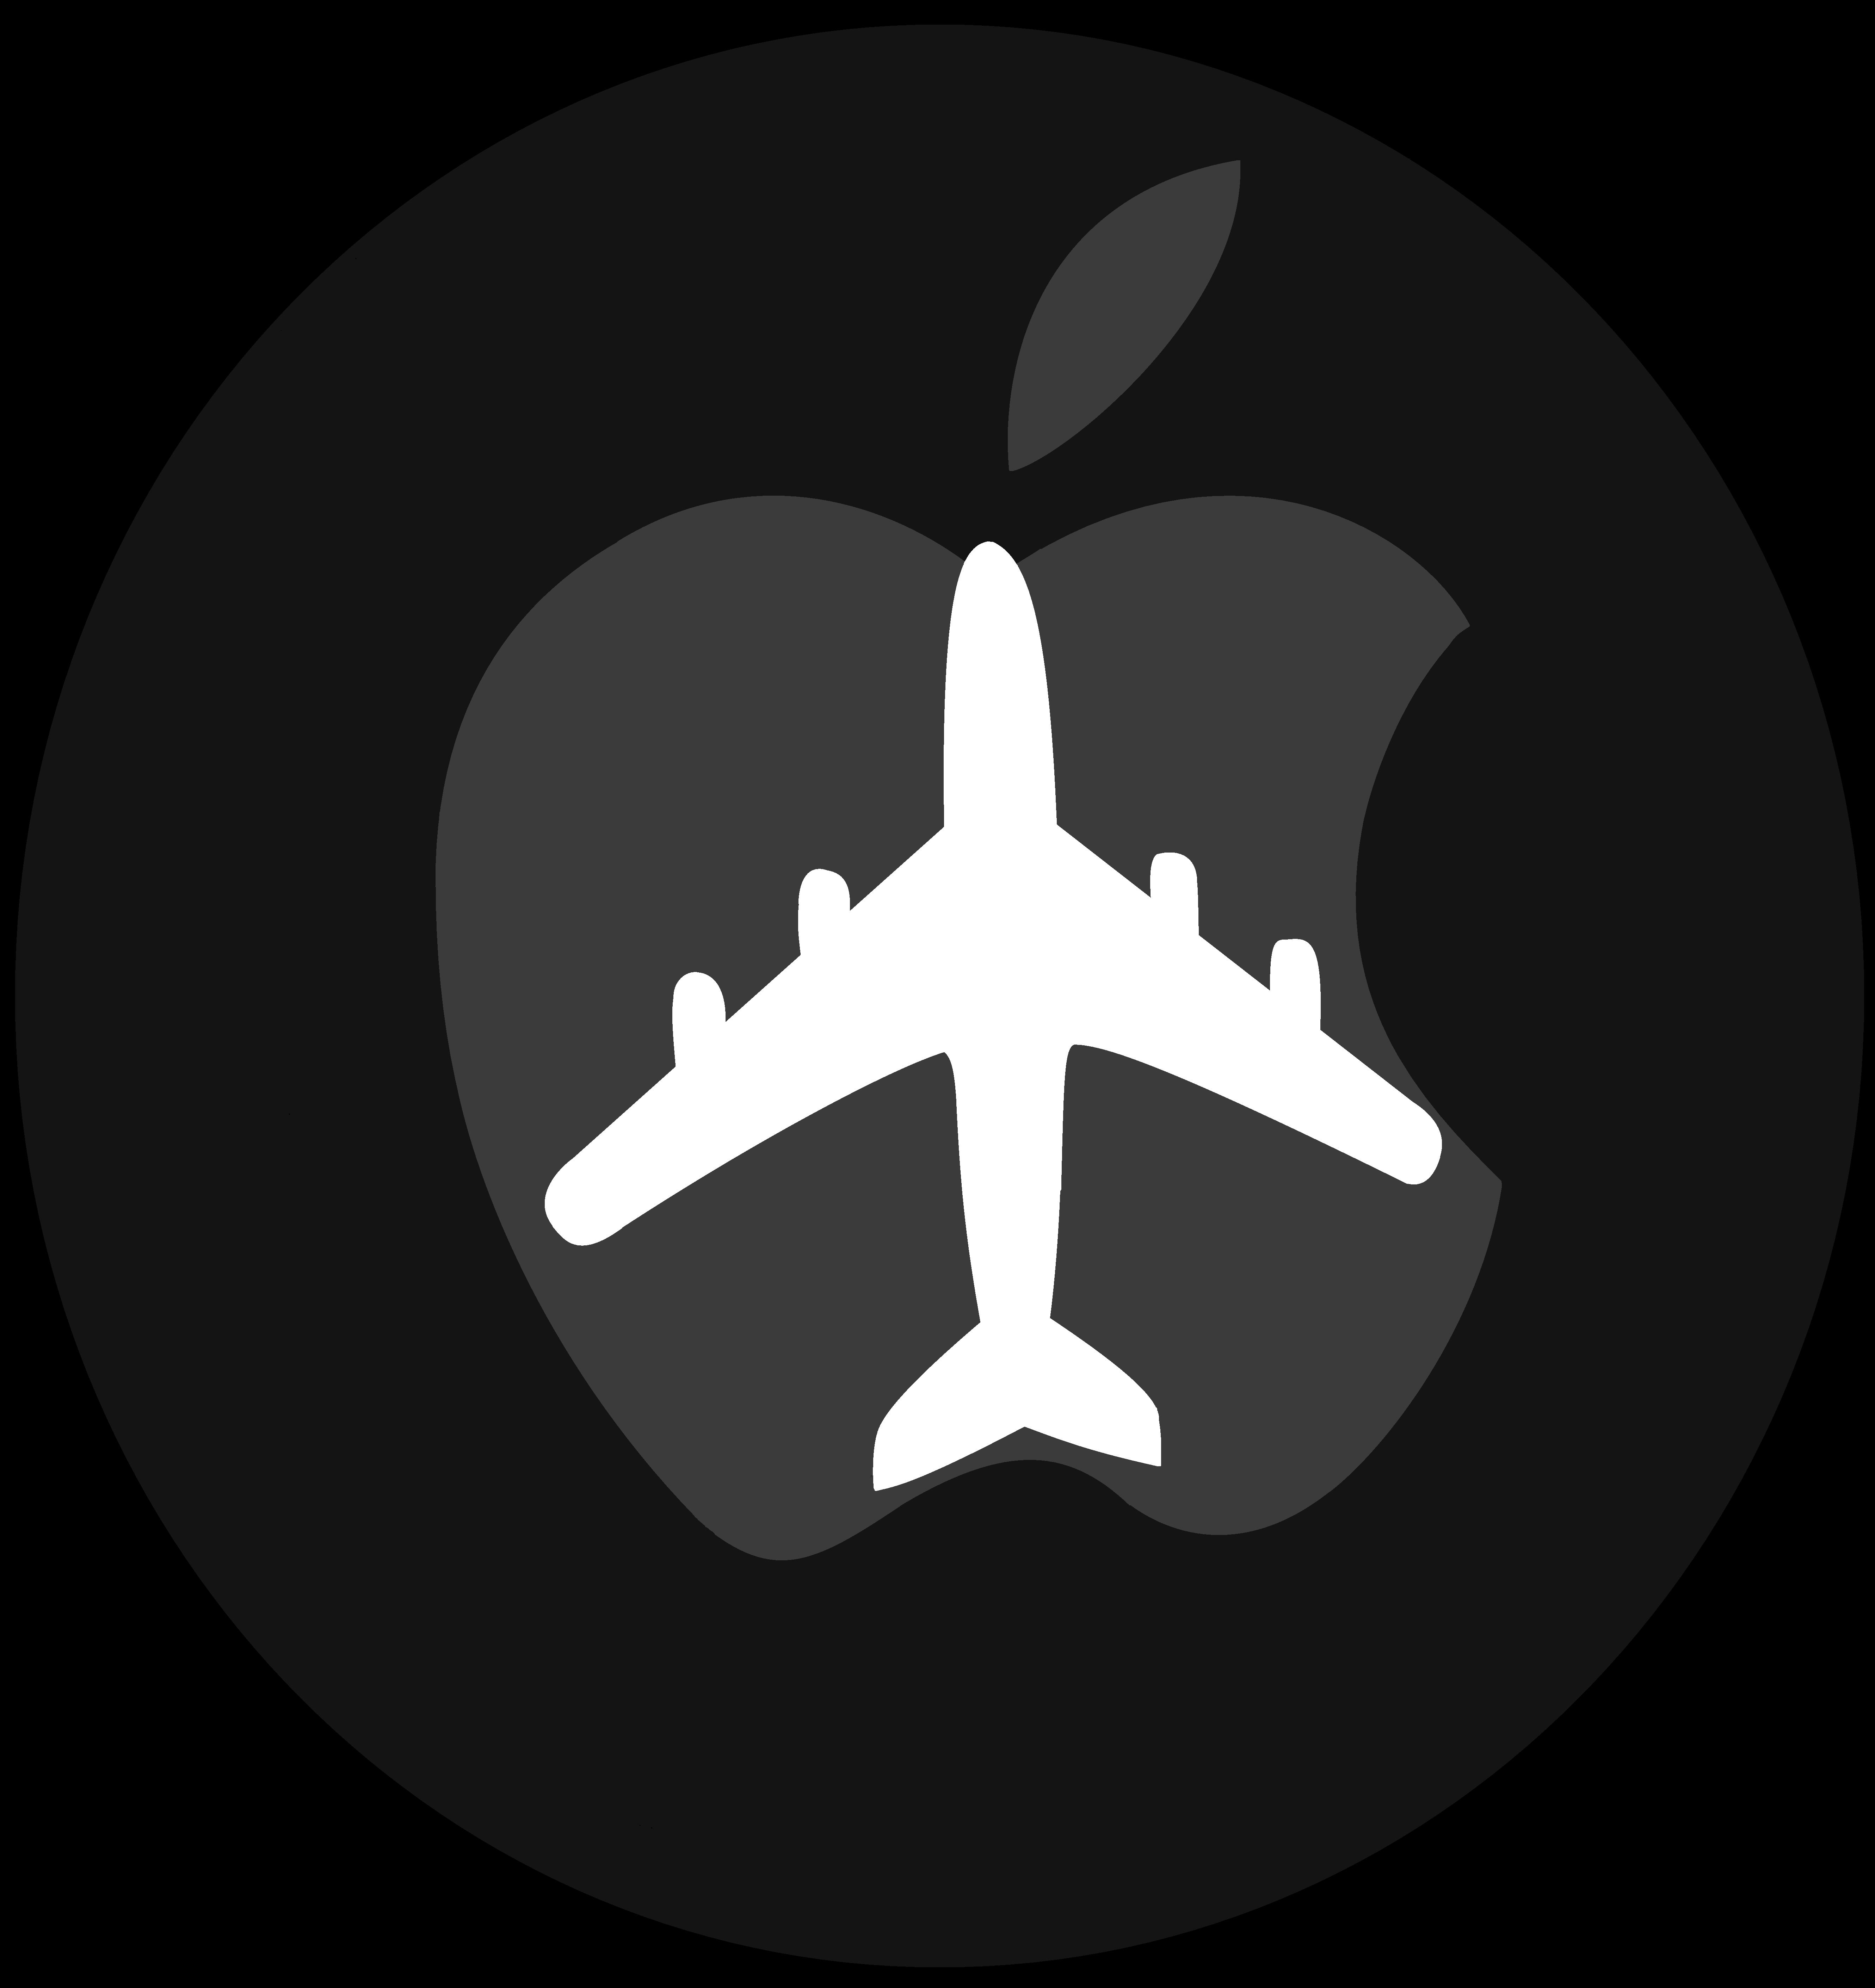 apple logo vector. apple logo with plane vector(with speedpaint) by windytheplaneh vector